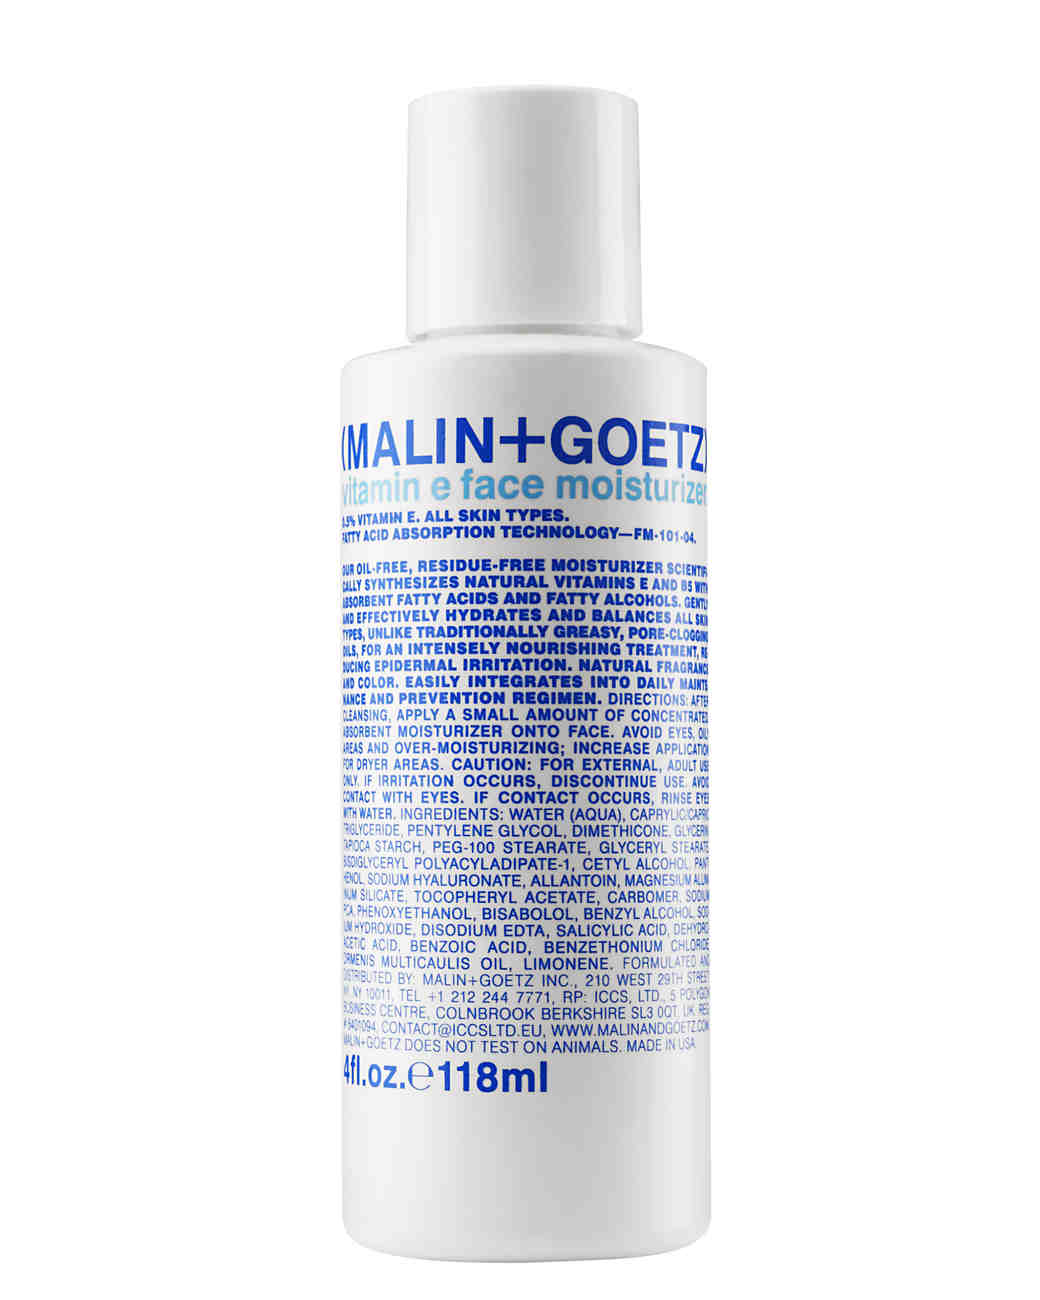 mens-grooming-products-malin-goetz-moisturizer-1114.jpg